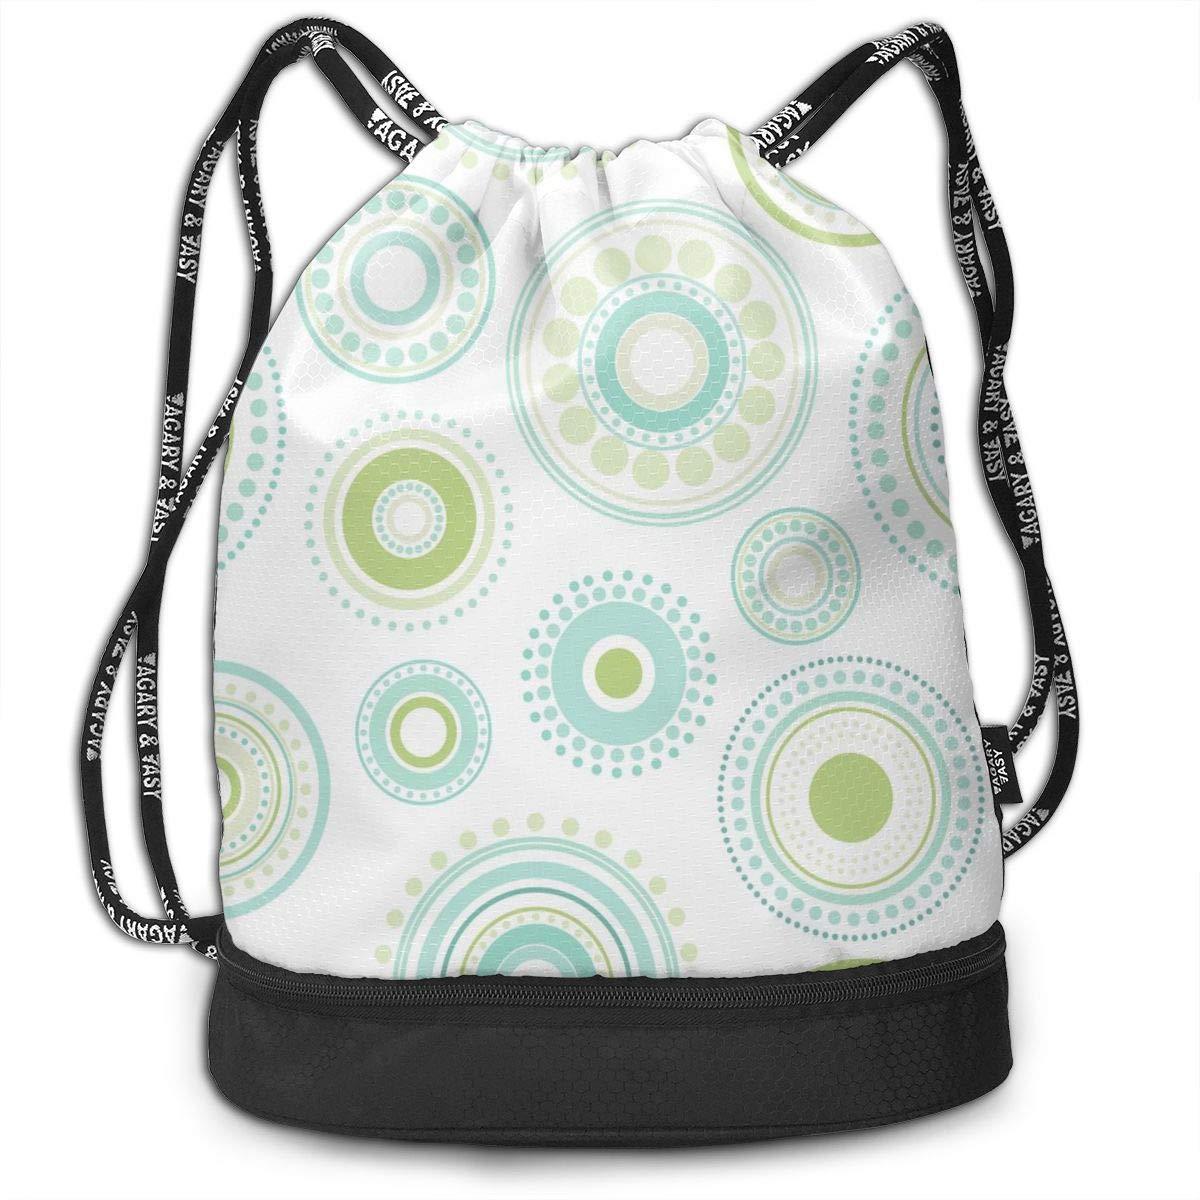 Bundle Backpacks Bright Artistic Splashes Gym Sack Drawstring Bags Casual Daypack Yoga Bag School Training Pouch